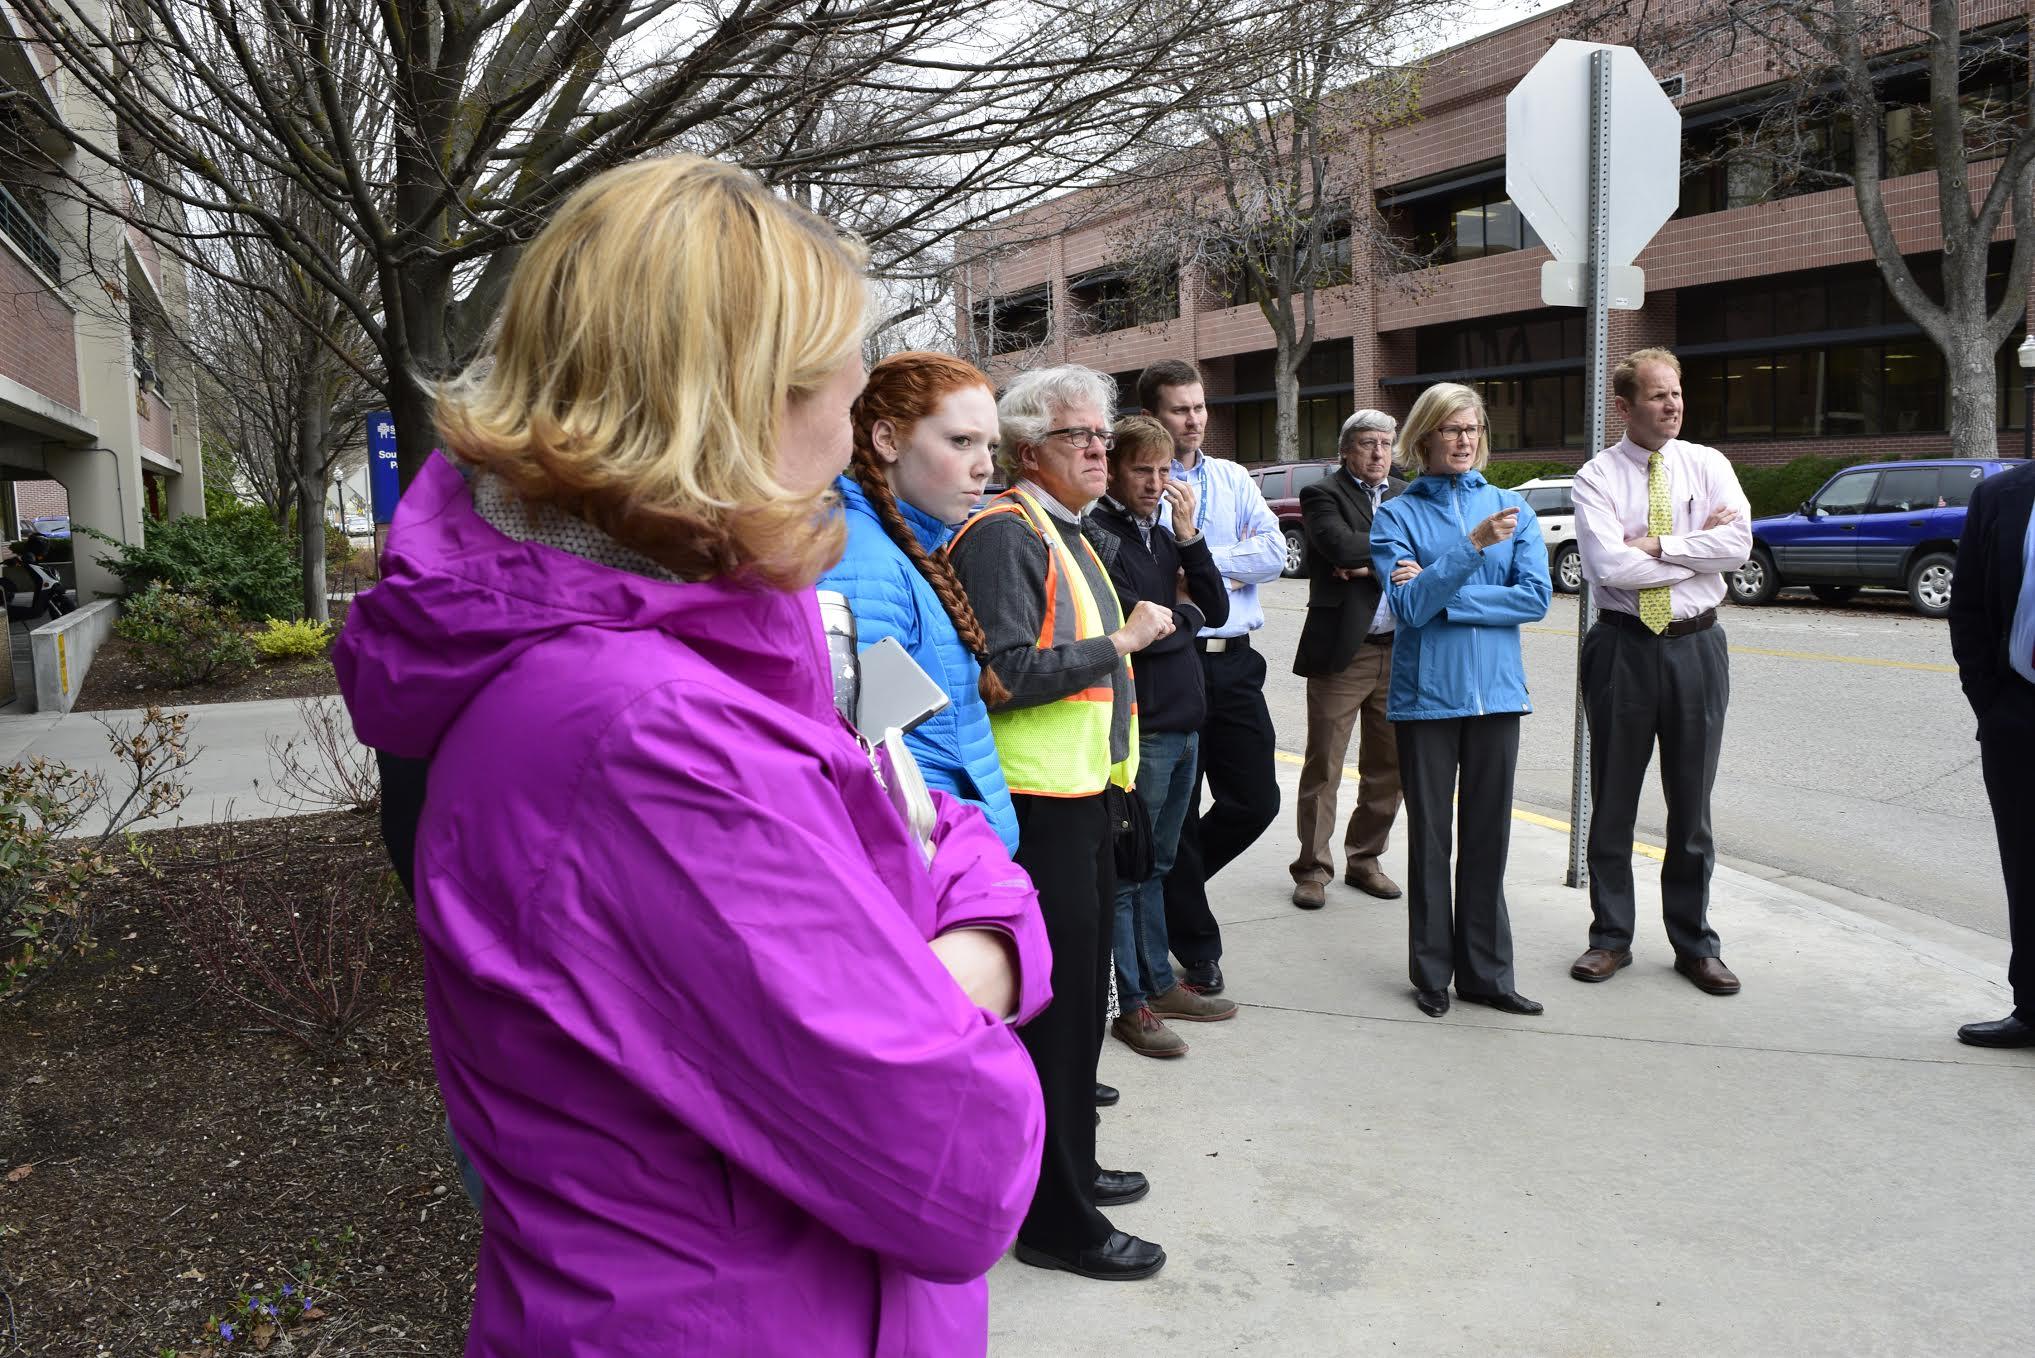 Stakeholders tour the Bannock St. plaza. Photo courtesy St. Luke's Health System